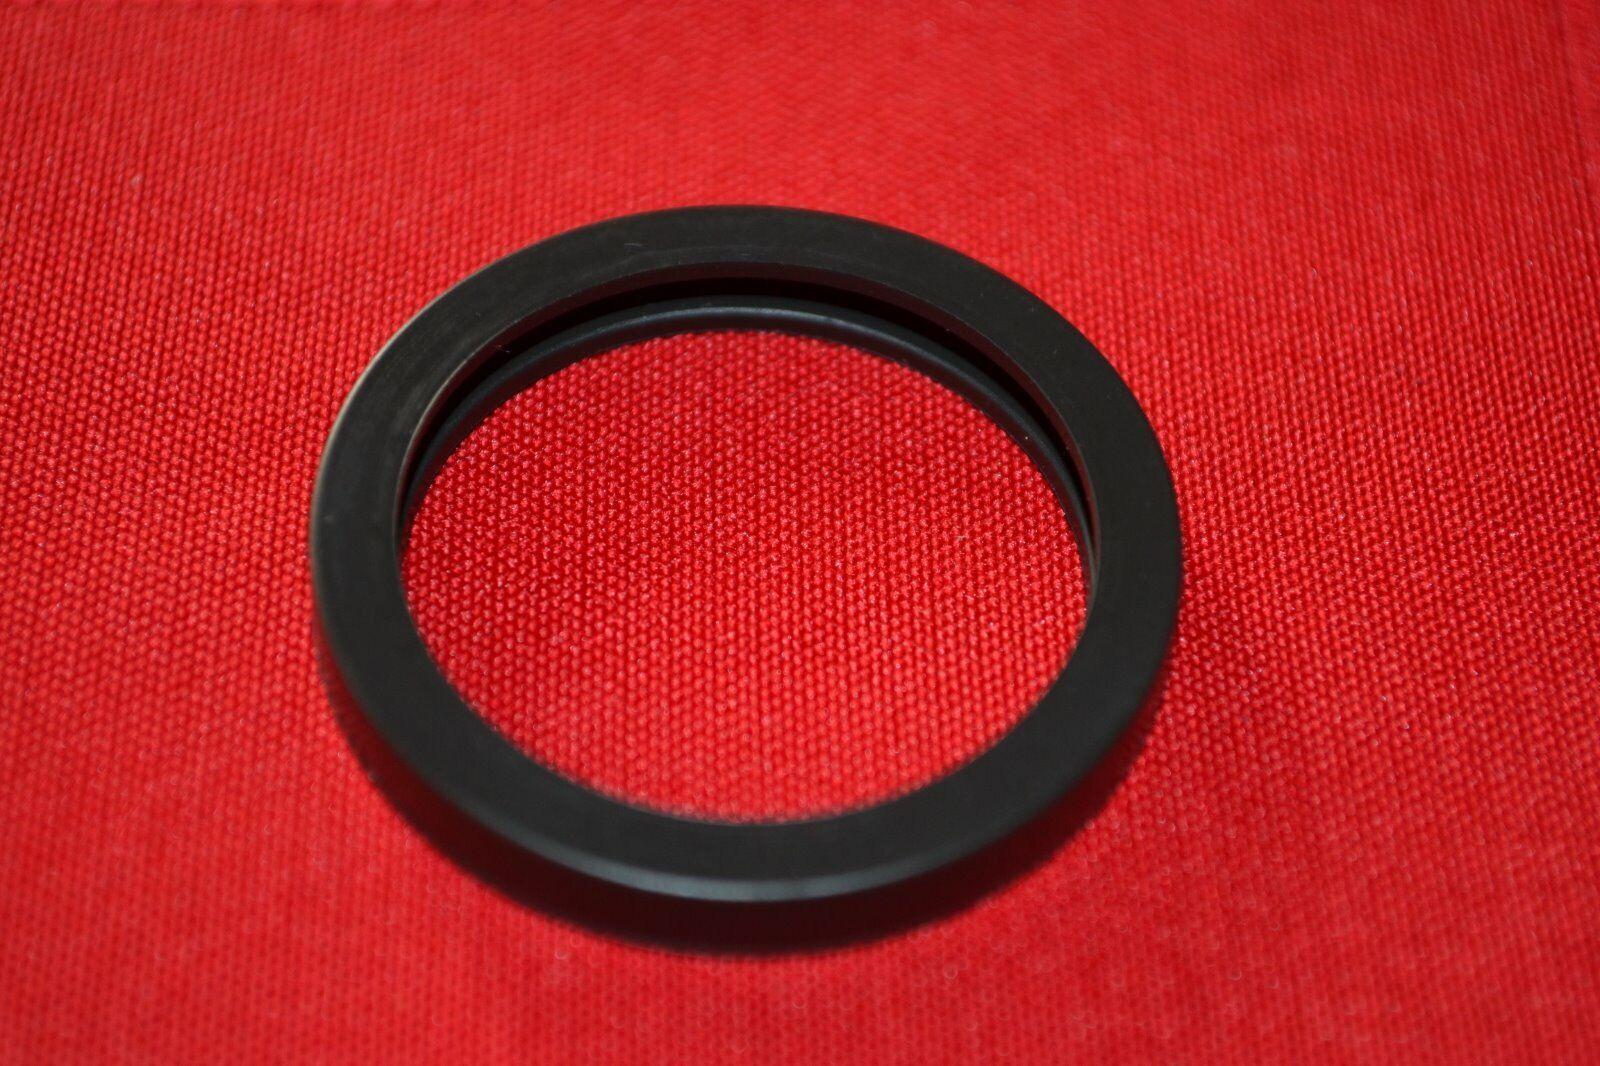 GUEHRING-SL 05535 size 8.0mm Carbide endmill 8mm OD shank OL 65mm FL 26mm CNC